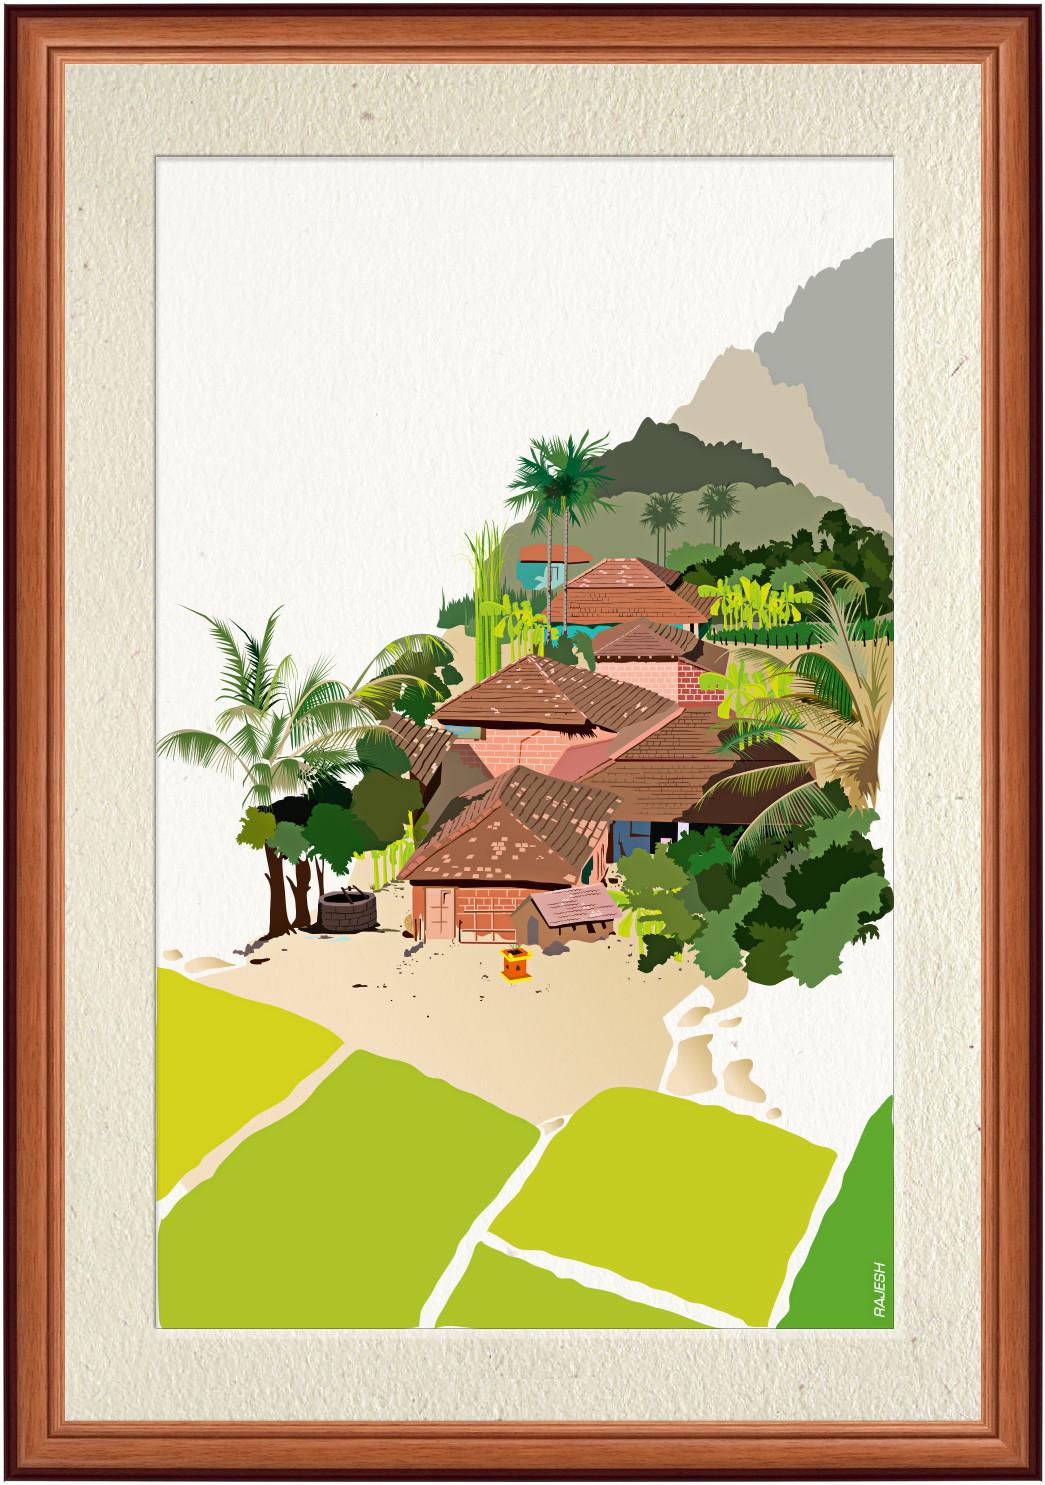 Rajesh sawant konkan framed